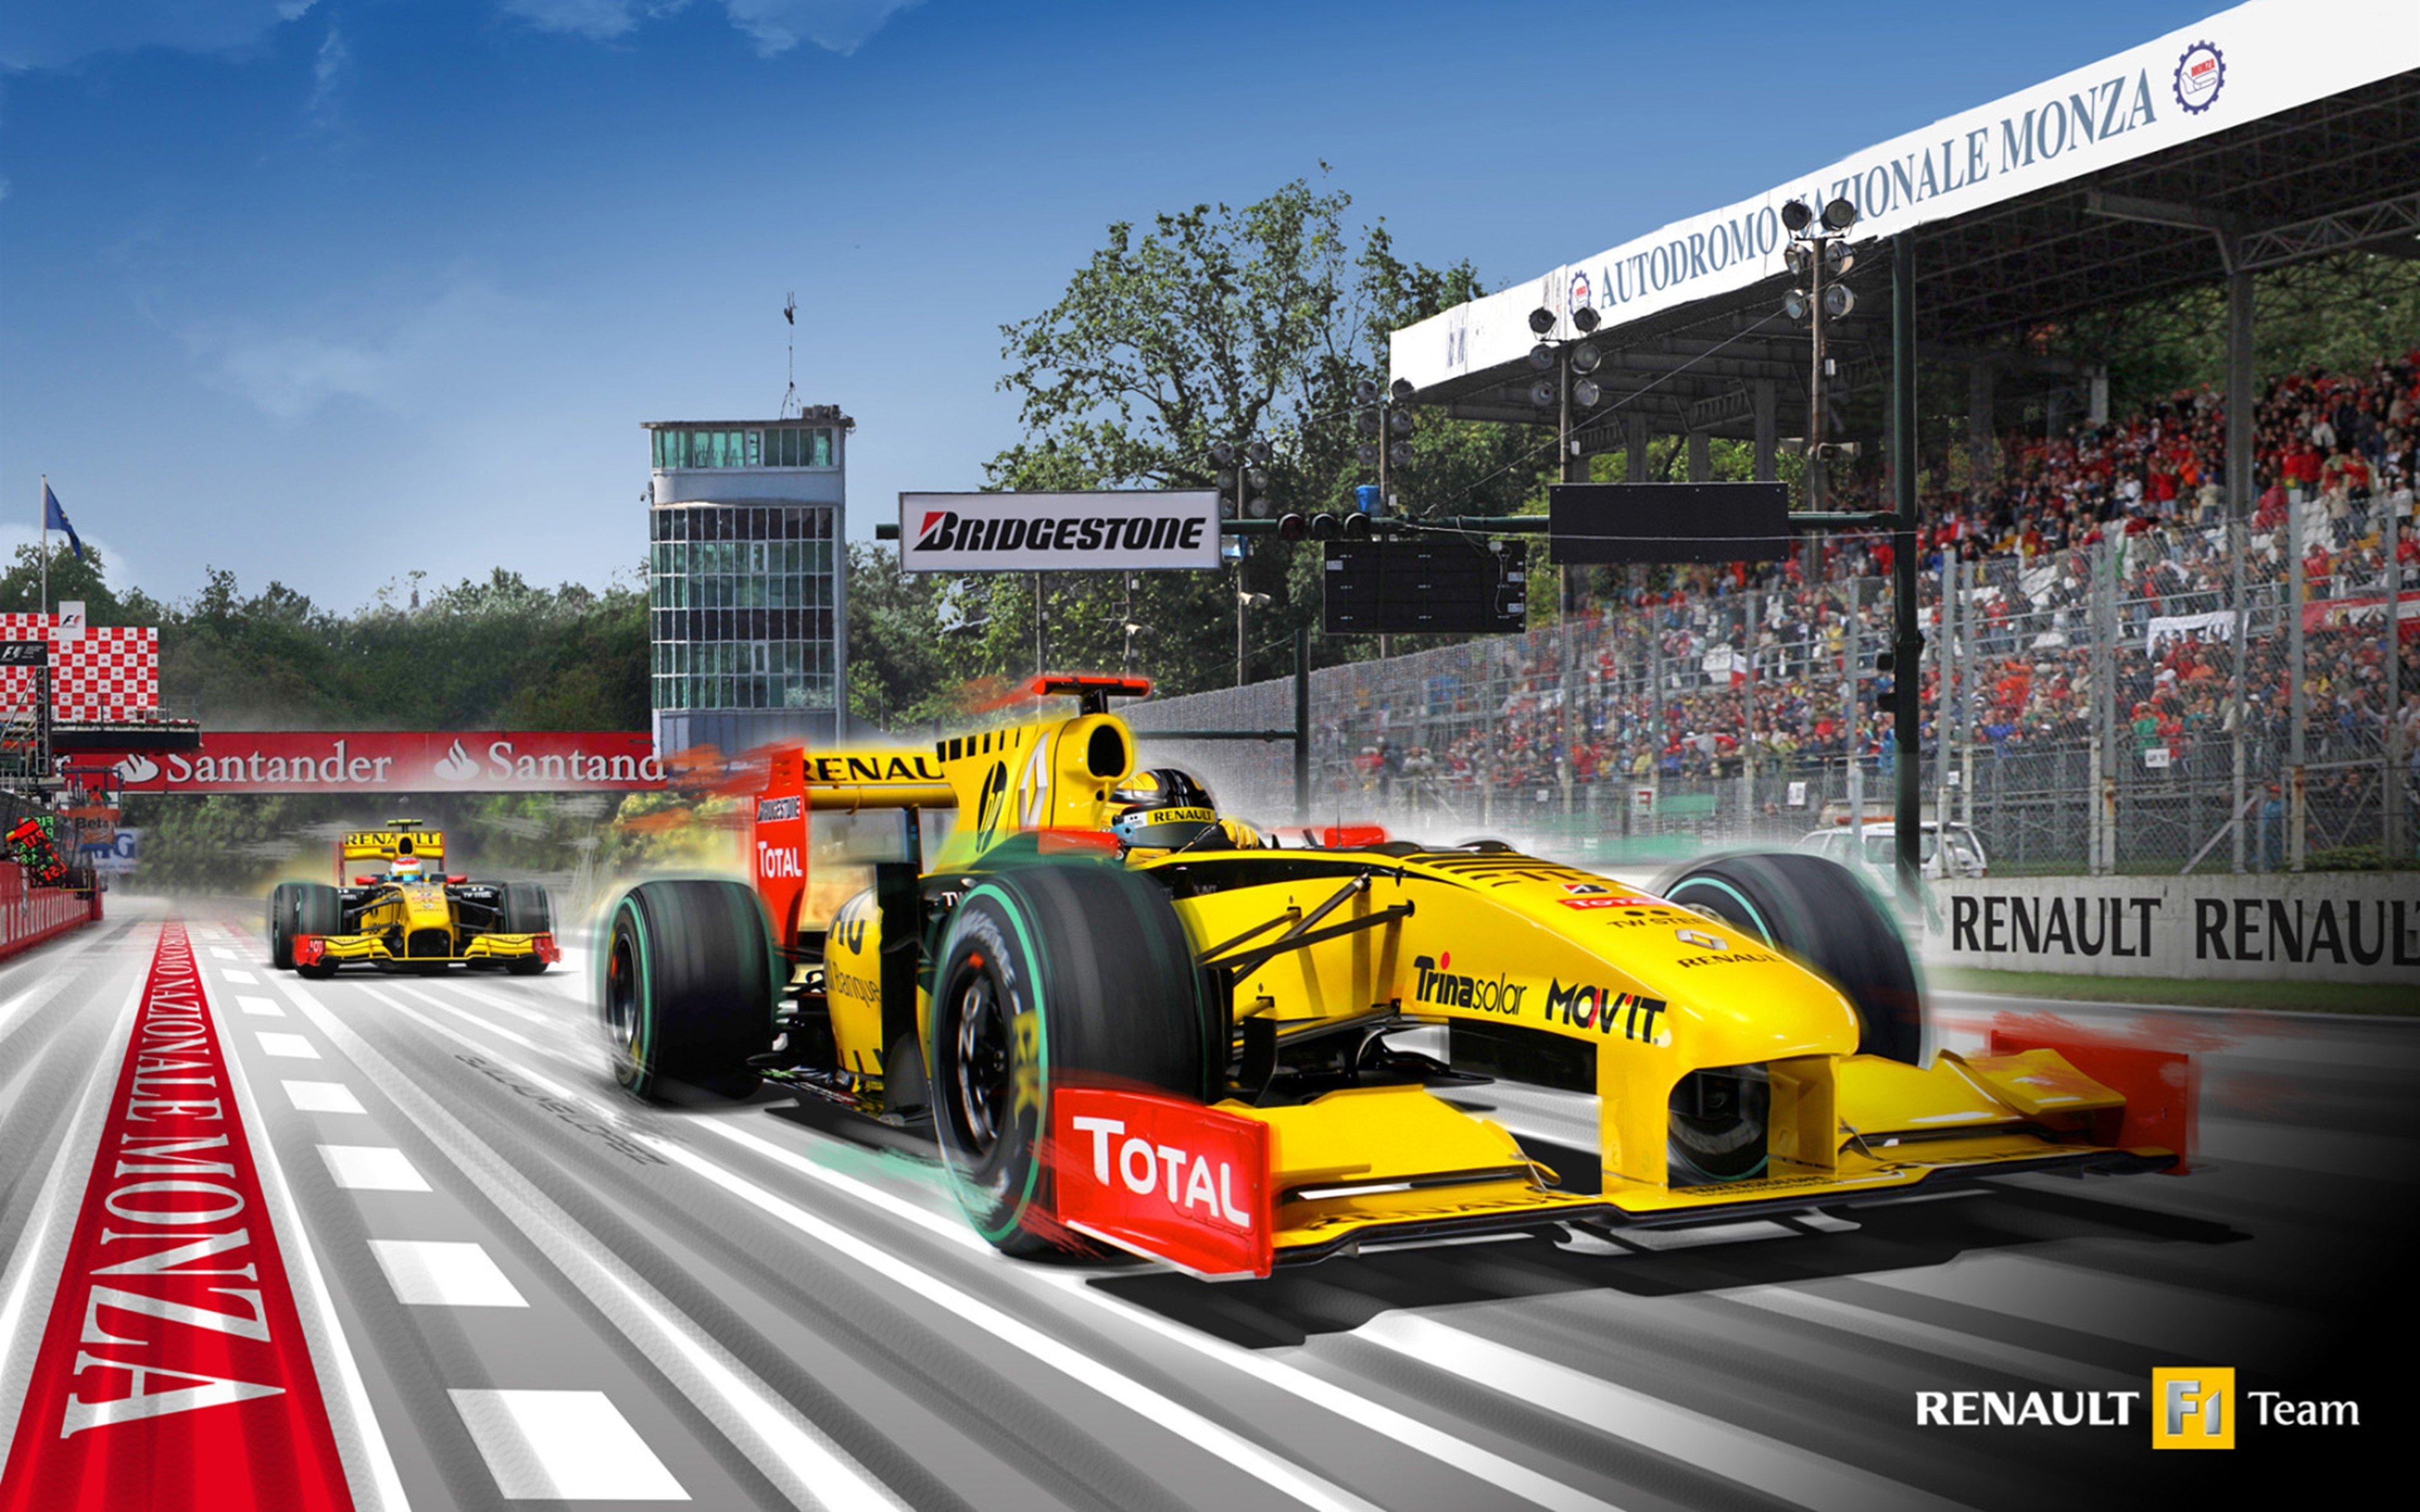 Small Car 2010 Formula 1 Renault R30 Race Car Racing Vehicle